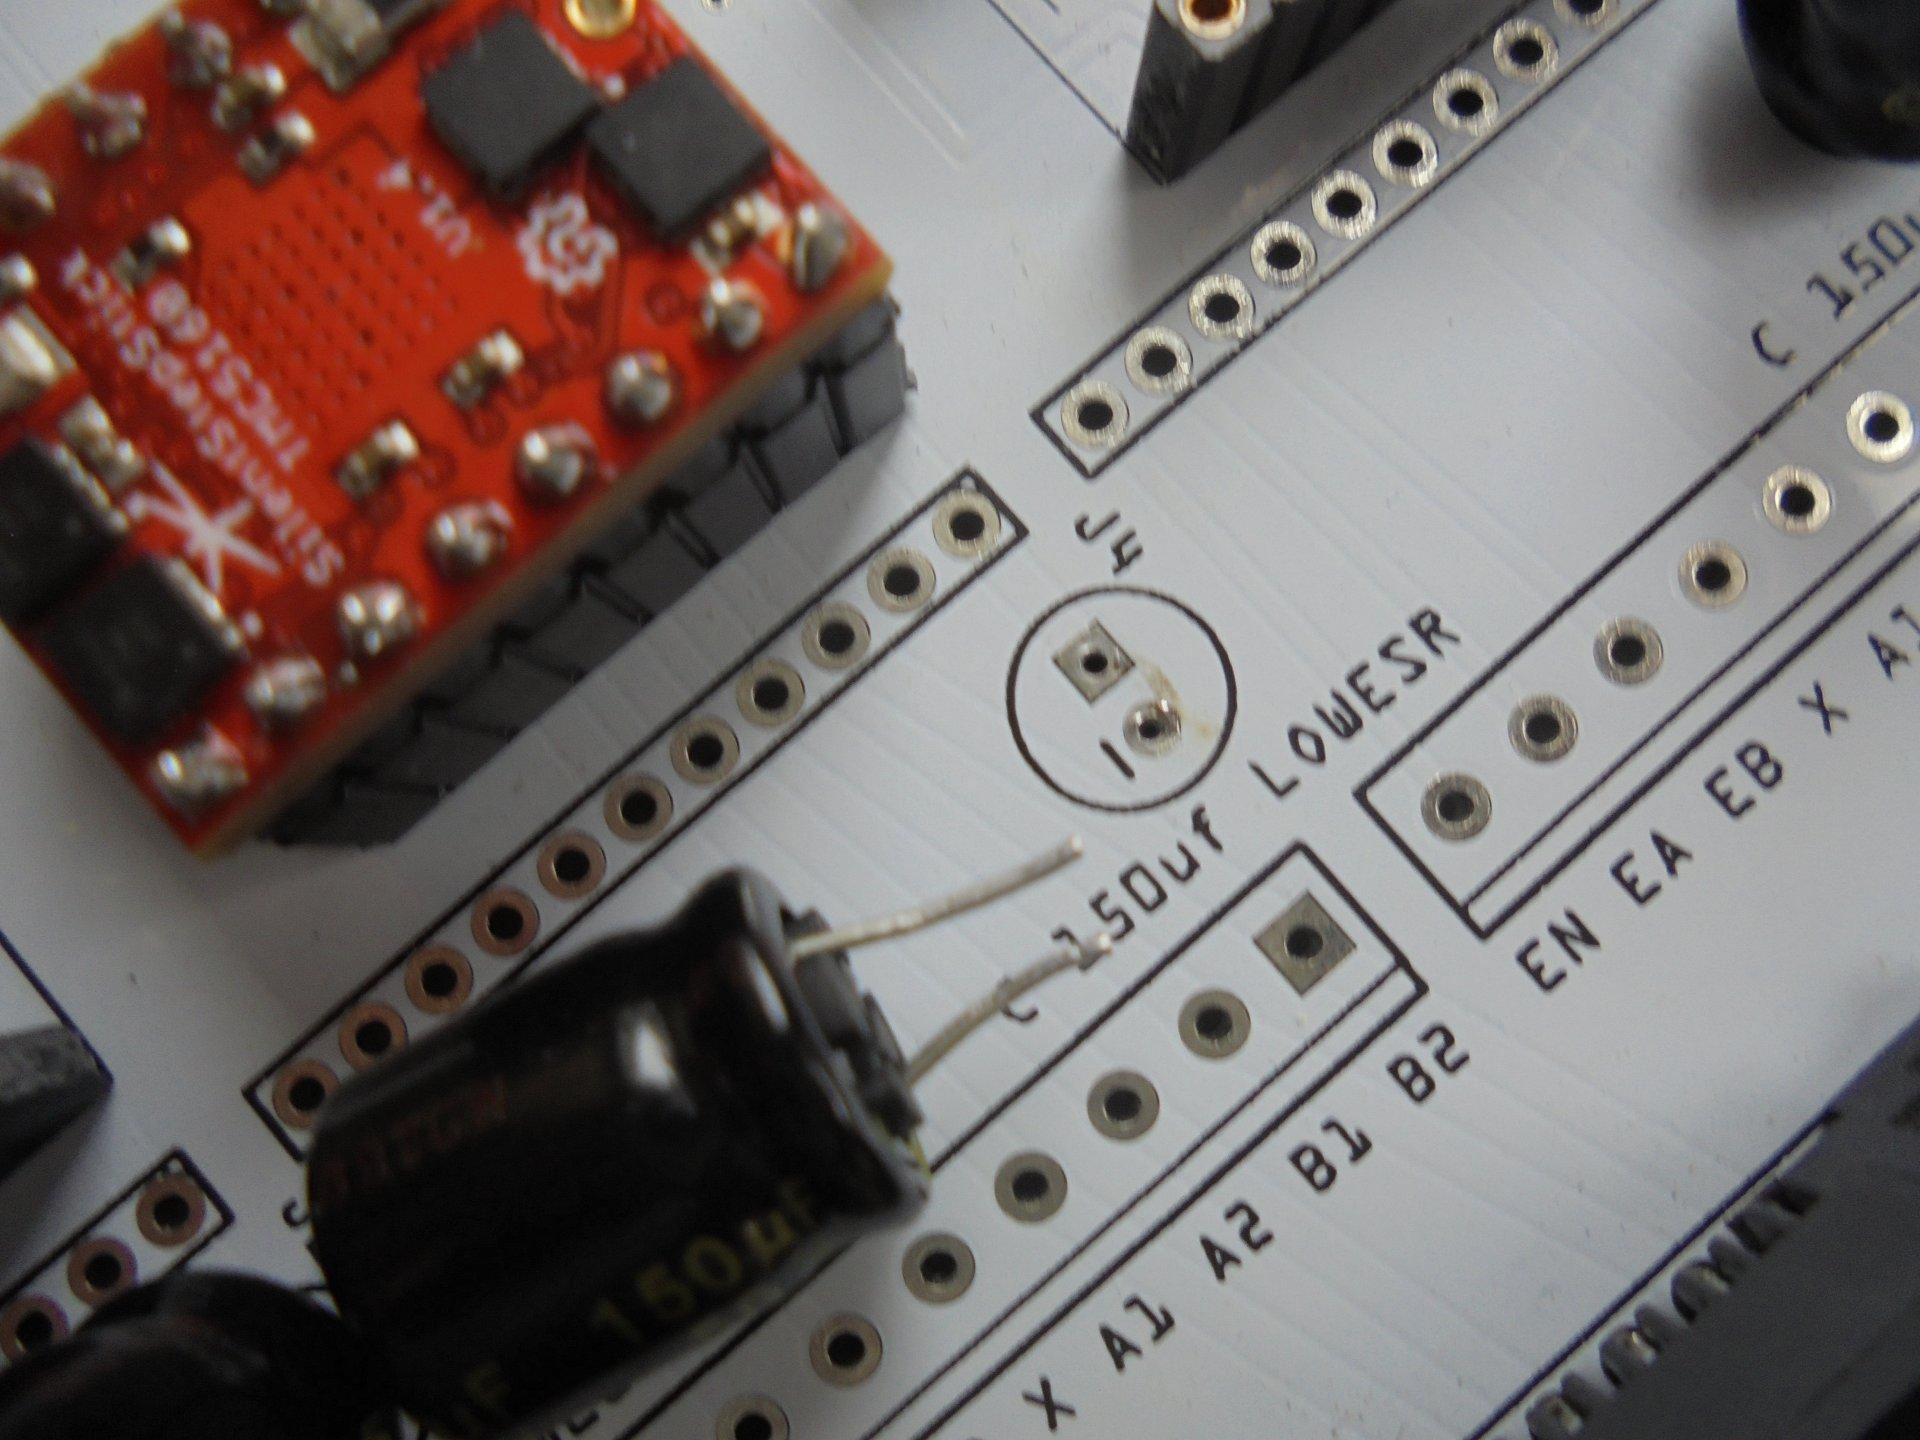 DSC06485.JPG